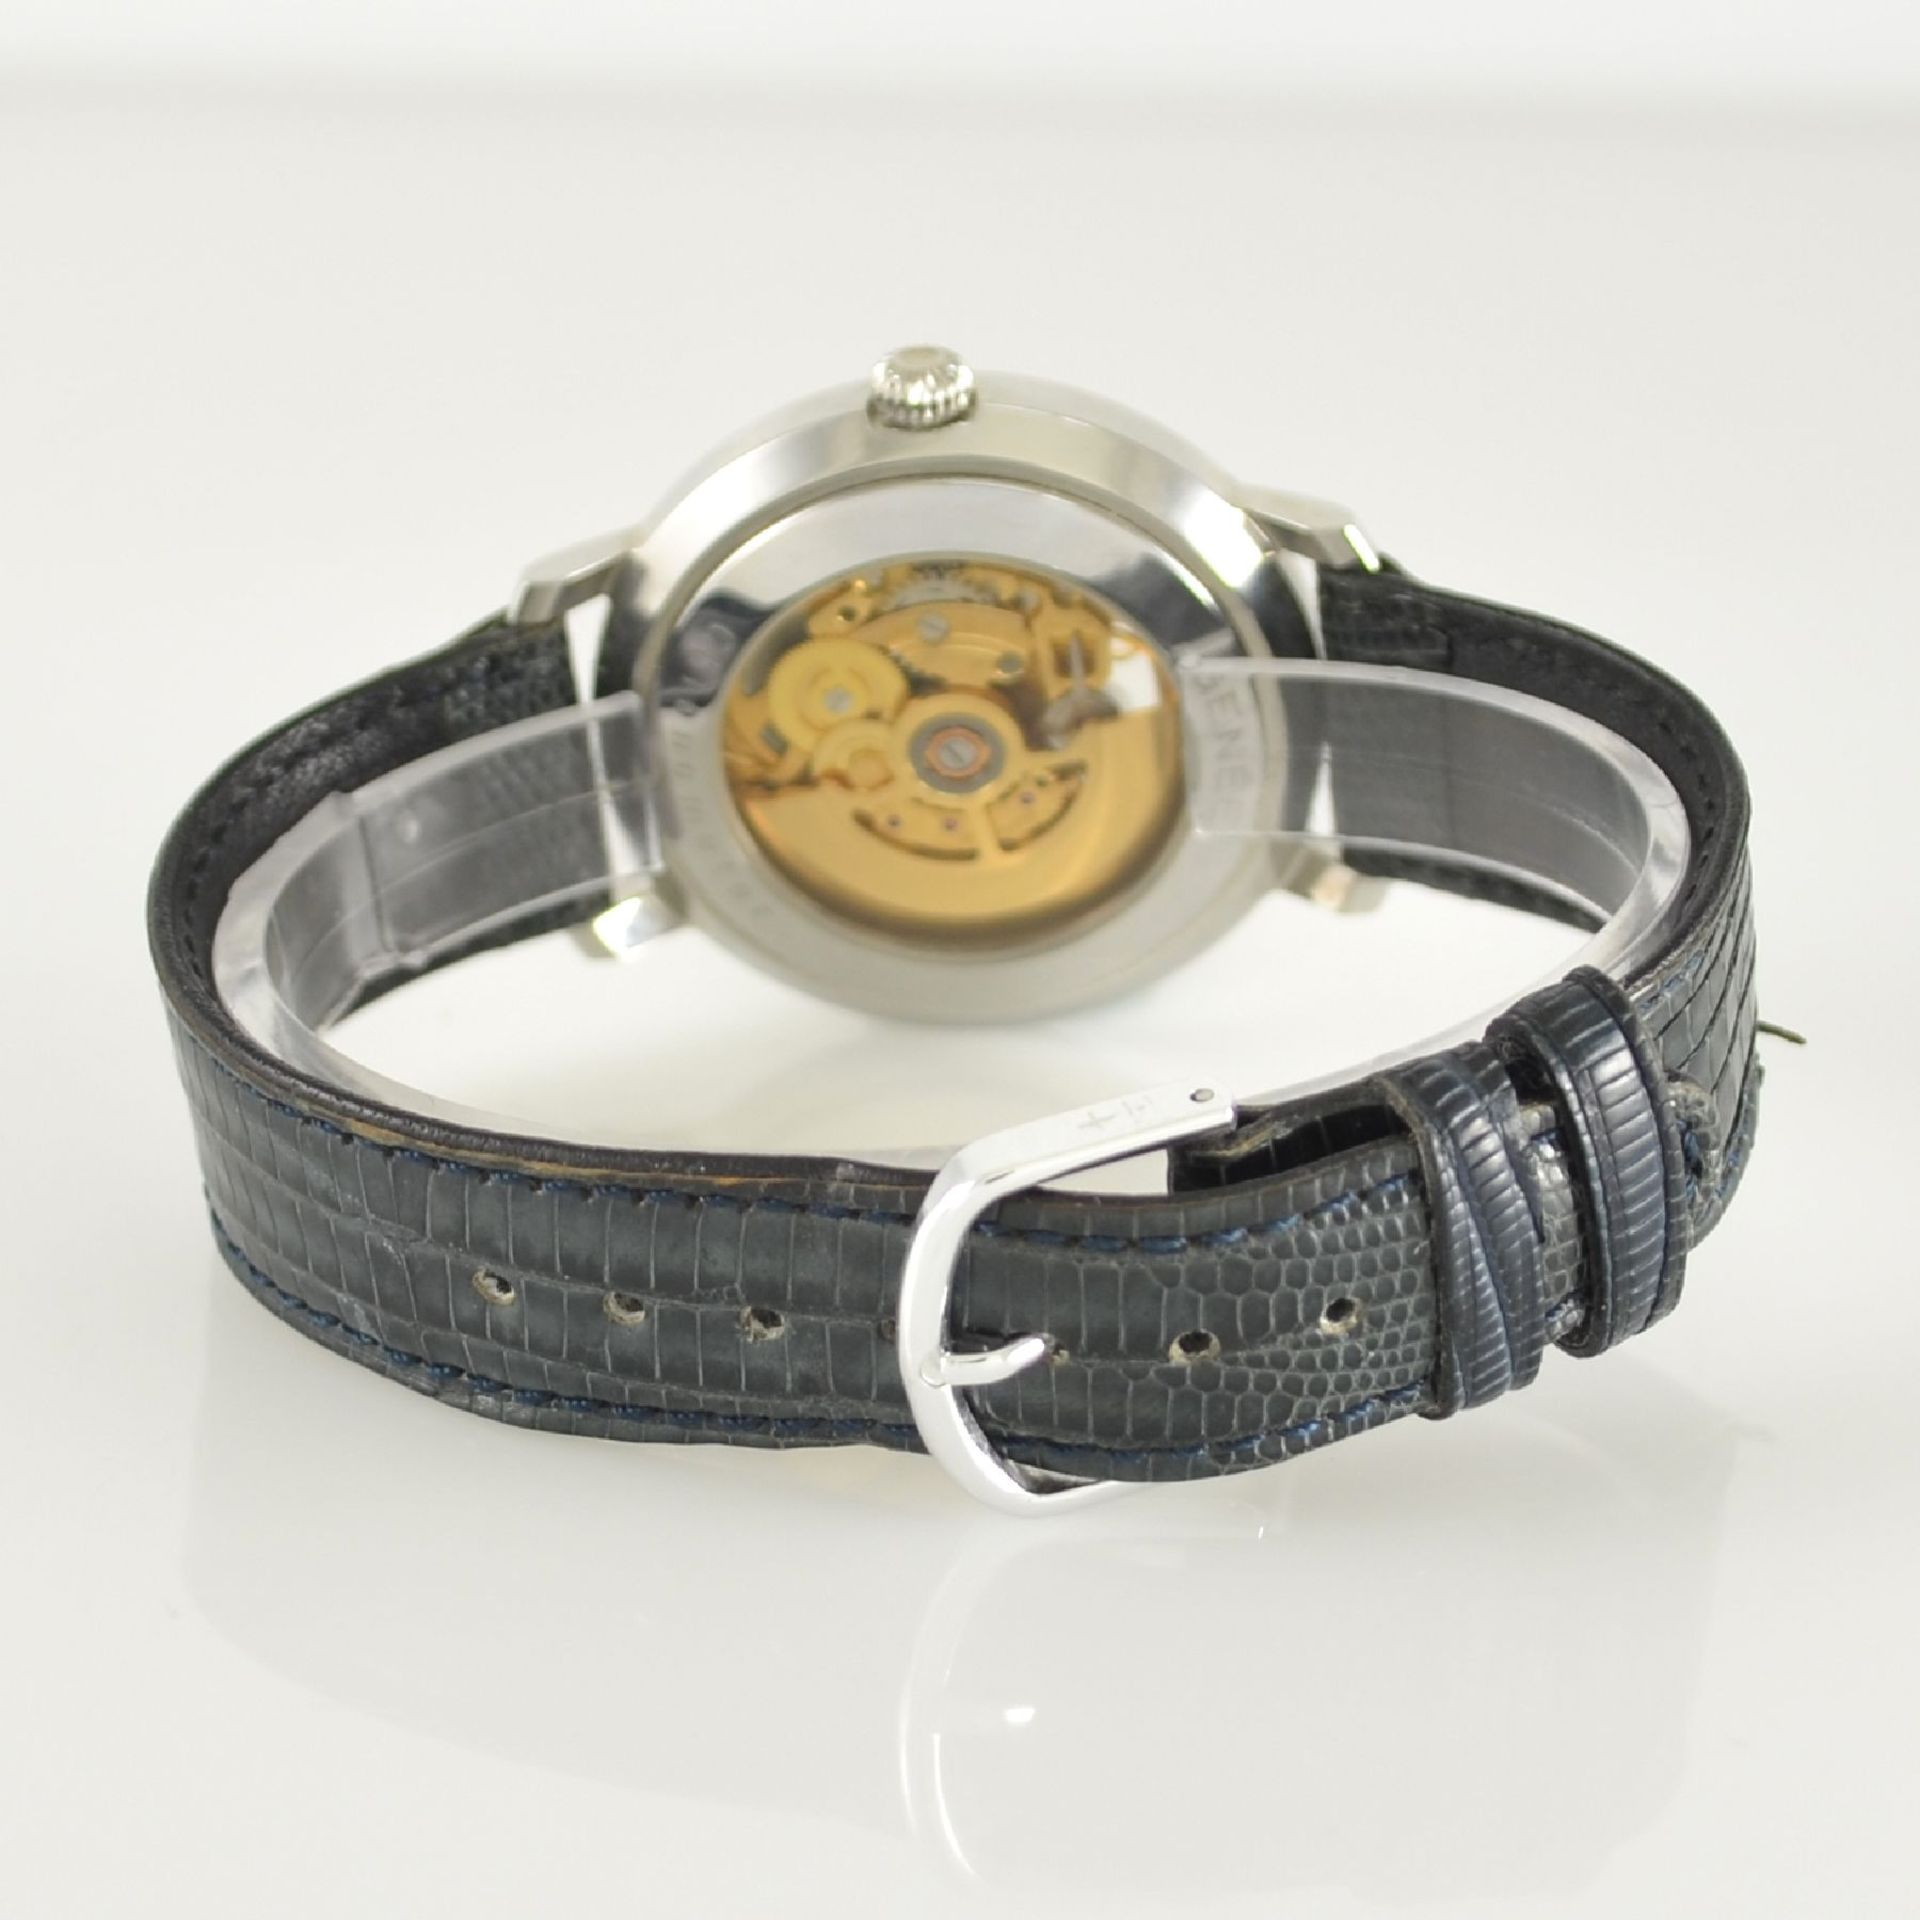 GENÉE No. 29 Chronometer-Herrenarmbanduhr in Stahl, Schweiz lt. beiliegendem Chronometerzertifikat - Bild 5 aus 8